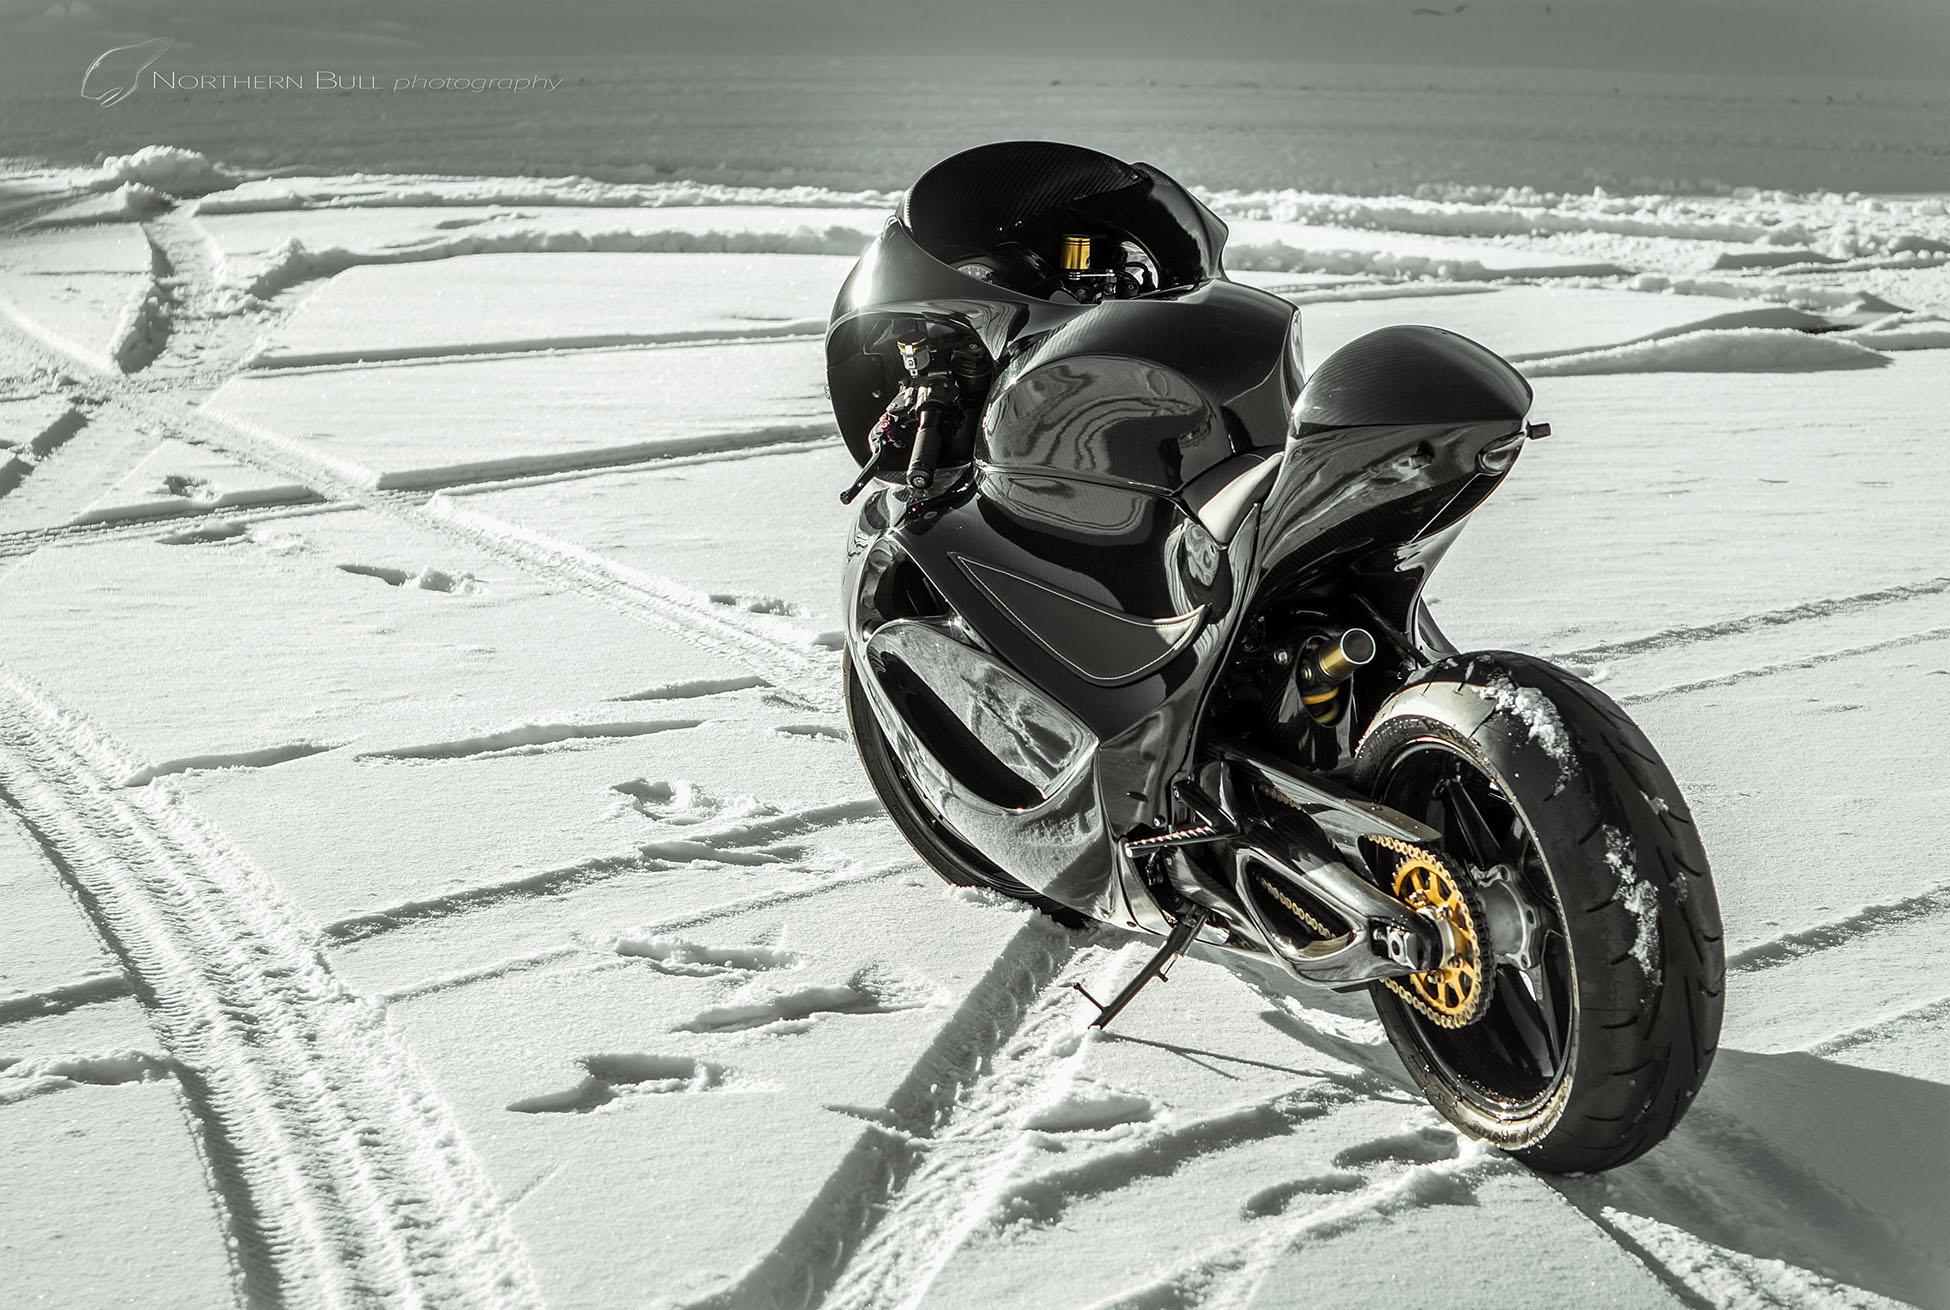 northern_bull_carbon_bike_snow.jpg